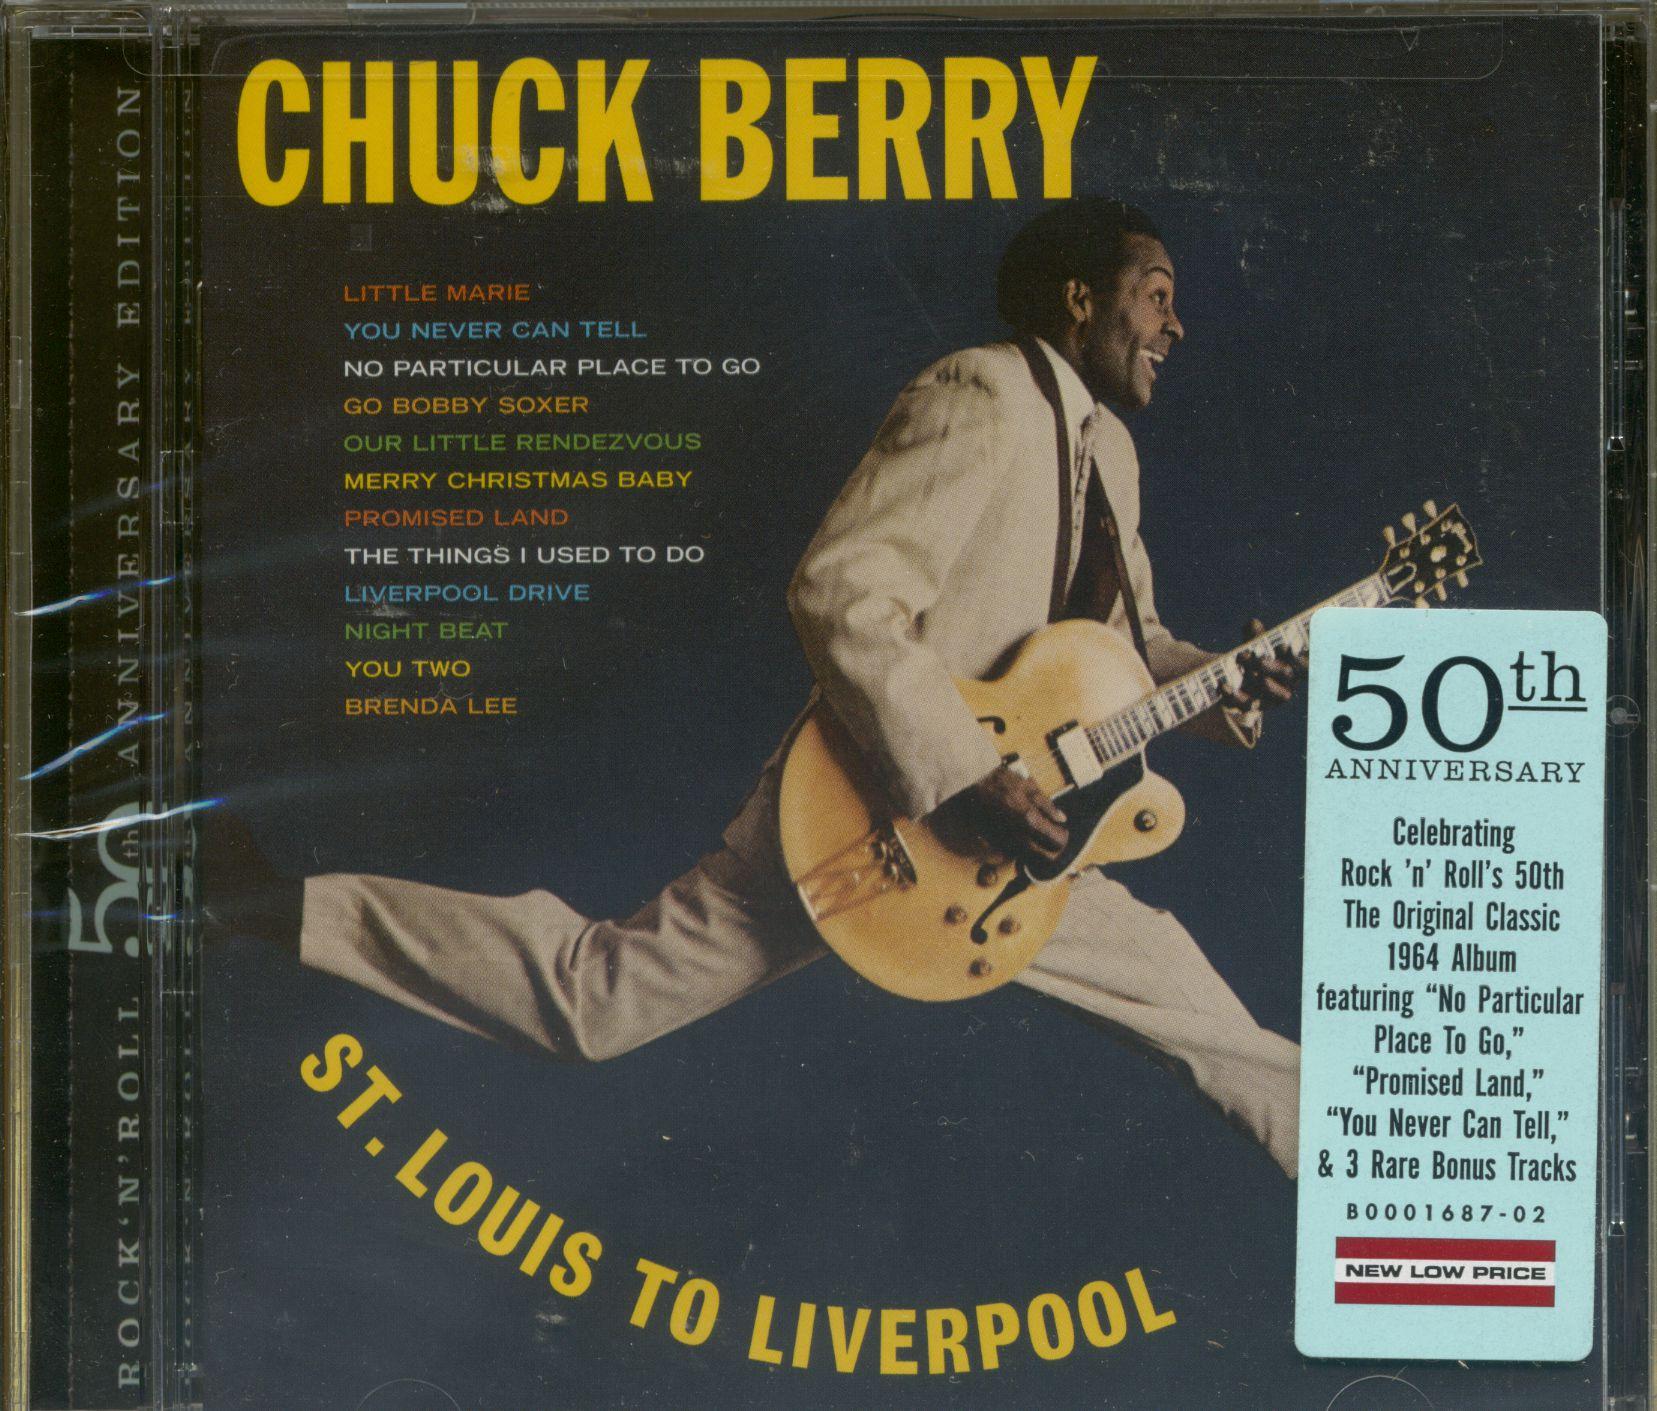 Chuck Berry St Louis To Liverpool 1964 Plus 50th Ann